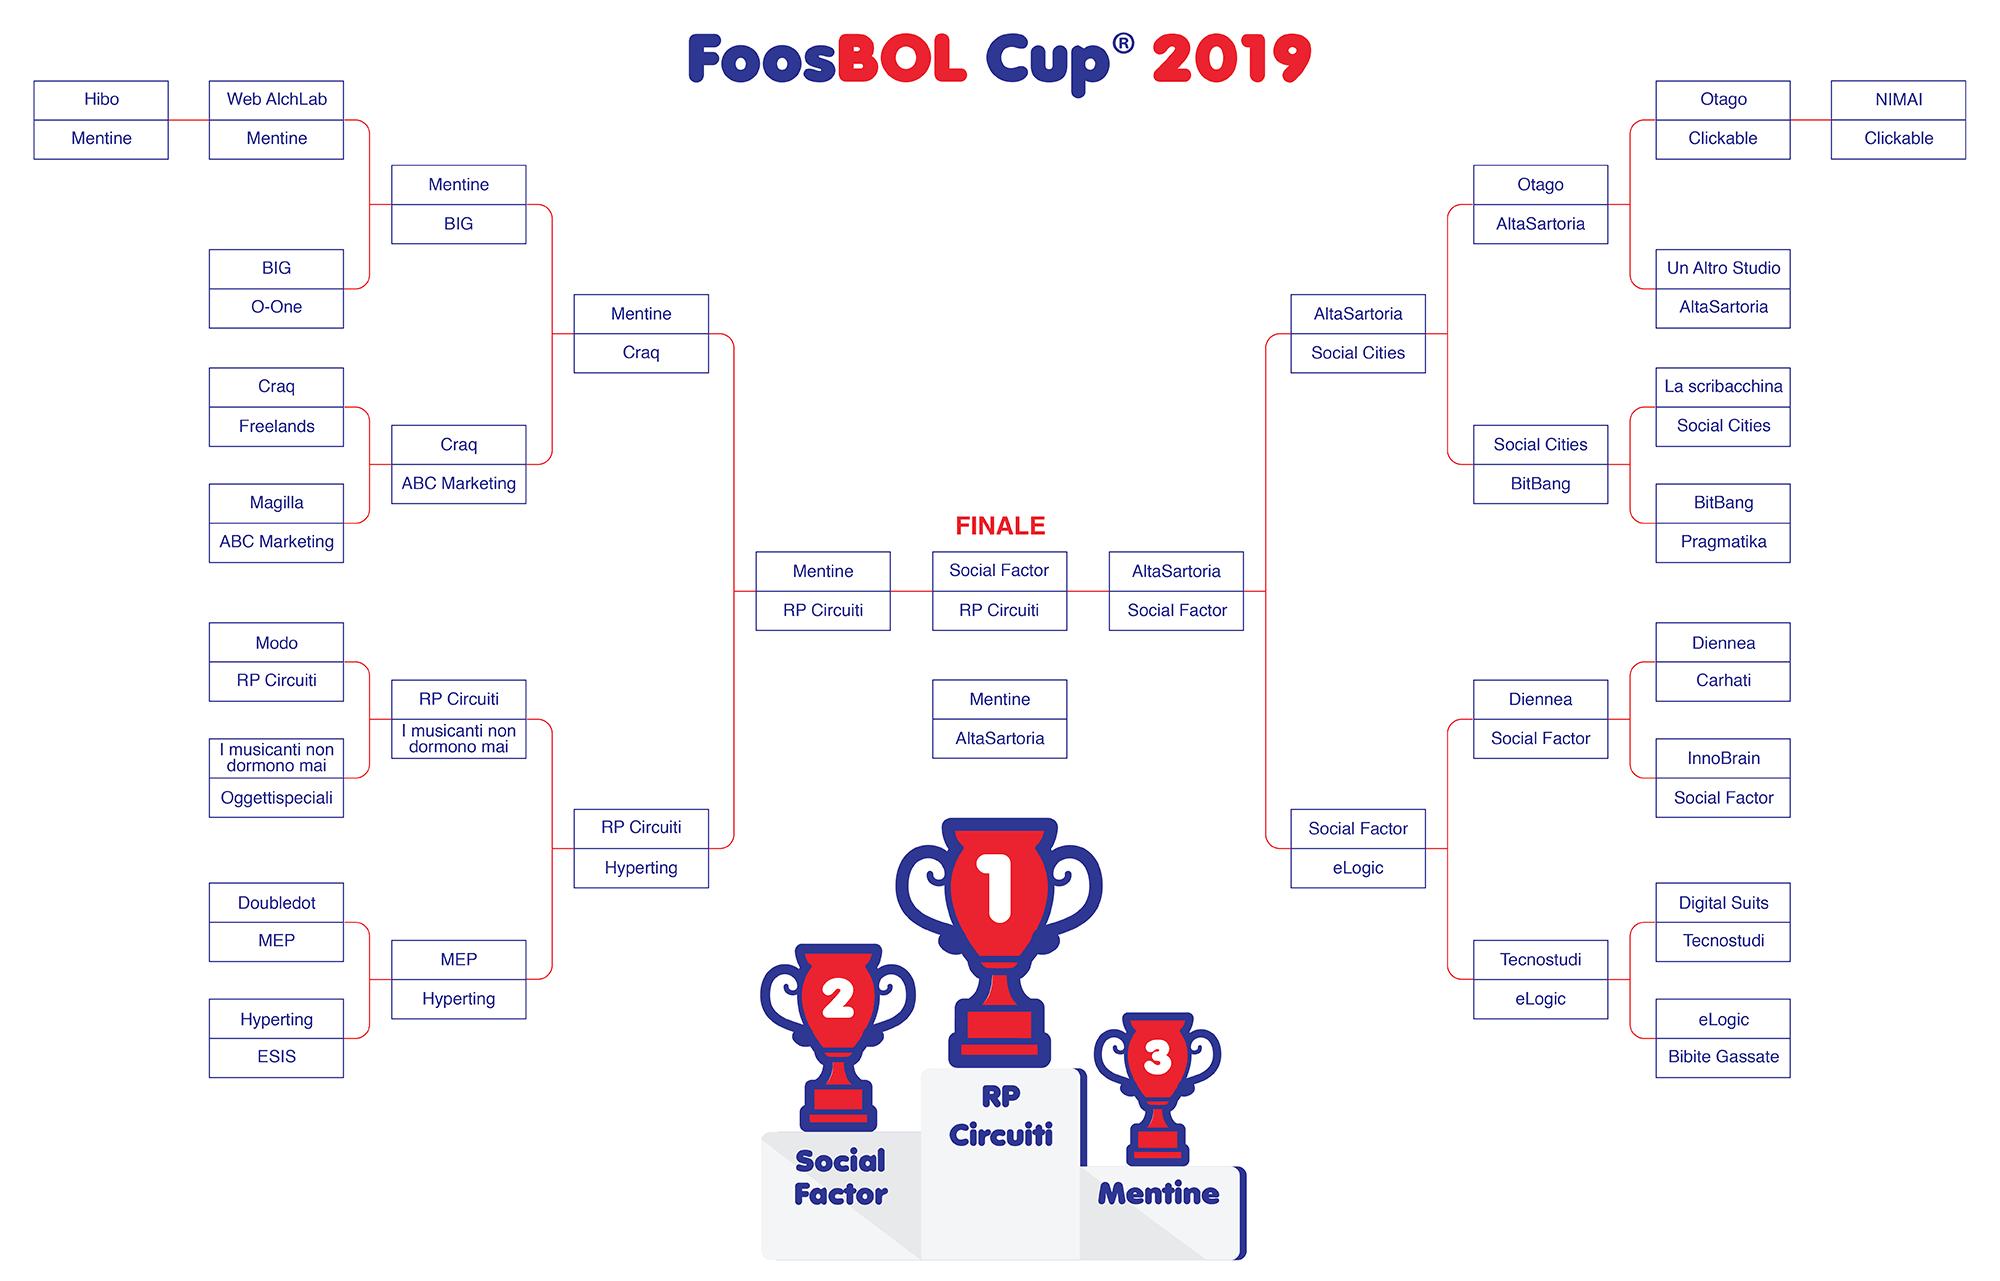 Tabellone FoosBol CUP 2019